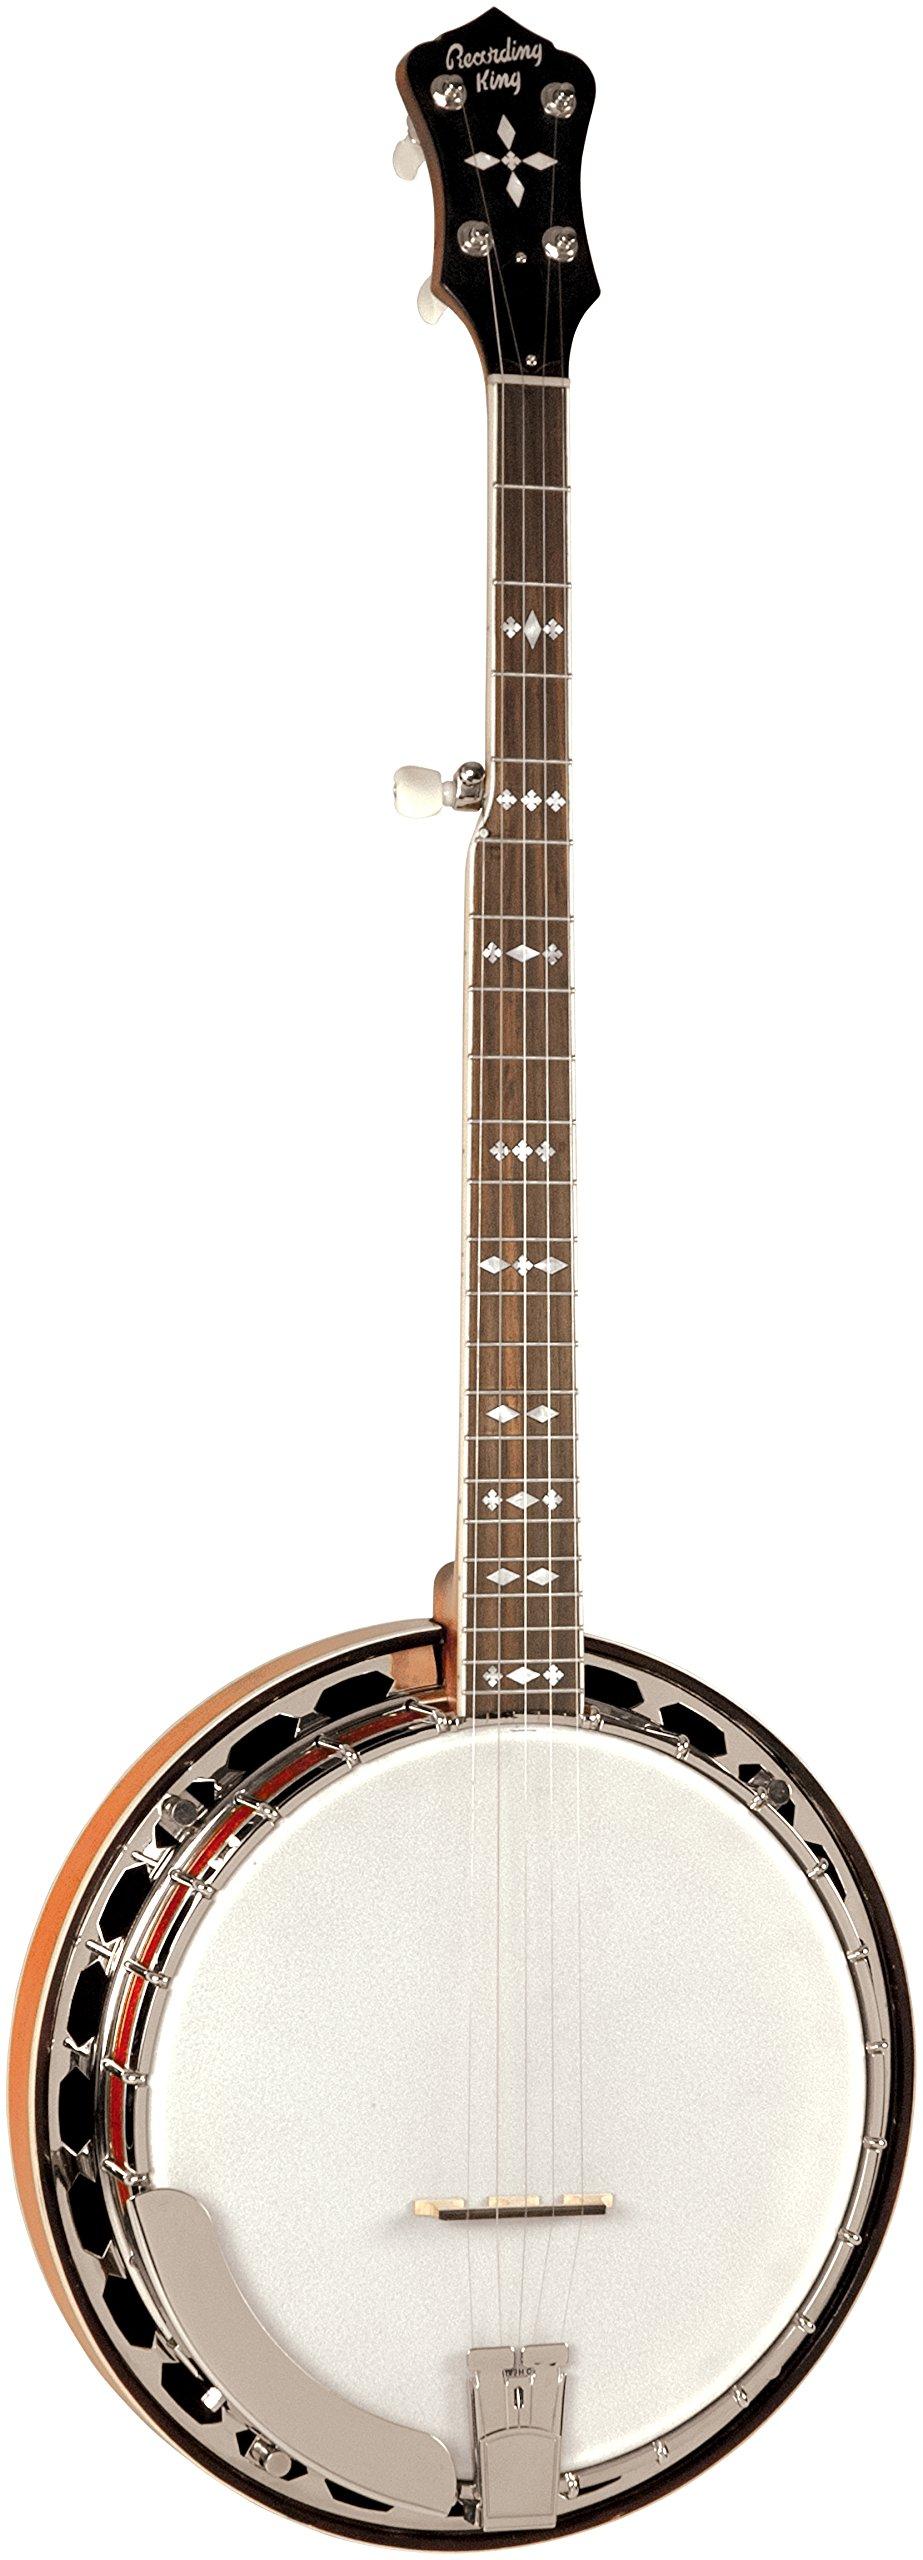 Recording King RK-R30-BGM BlueGrass Machine Banjo